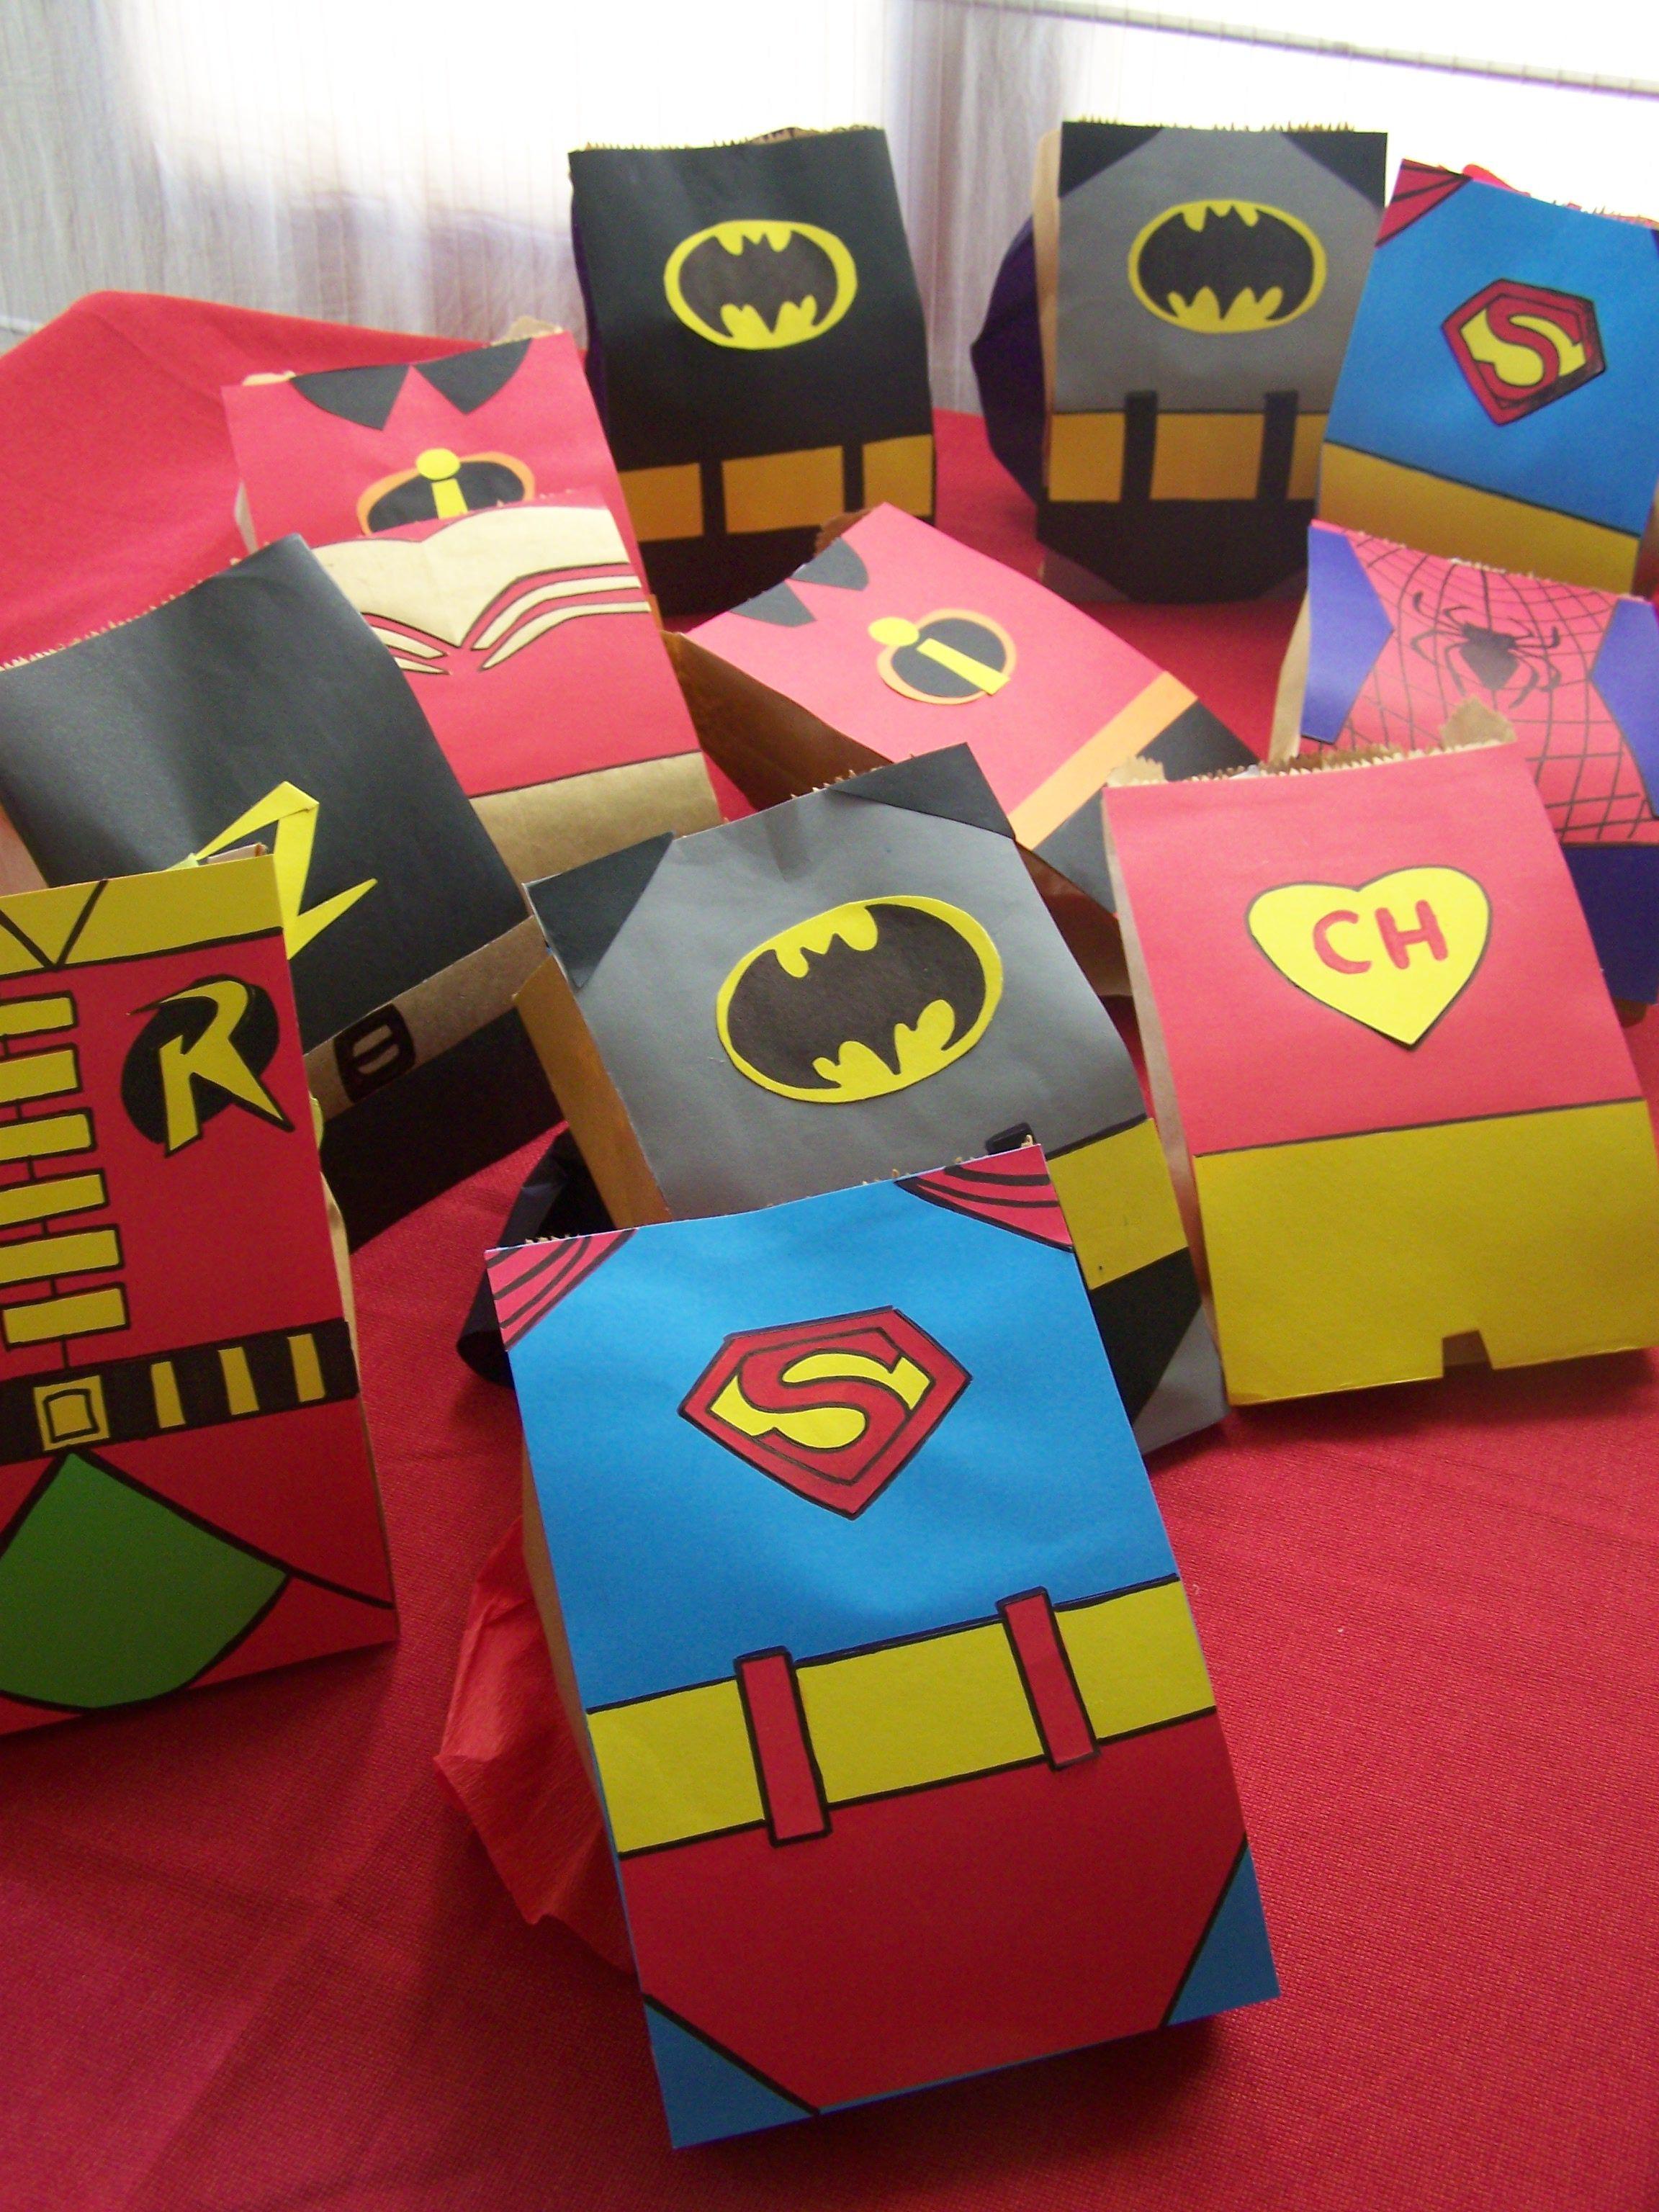 002 Superheroes in paper bag form Camp ideas Pinterest